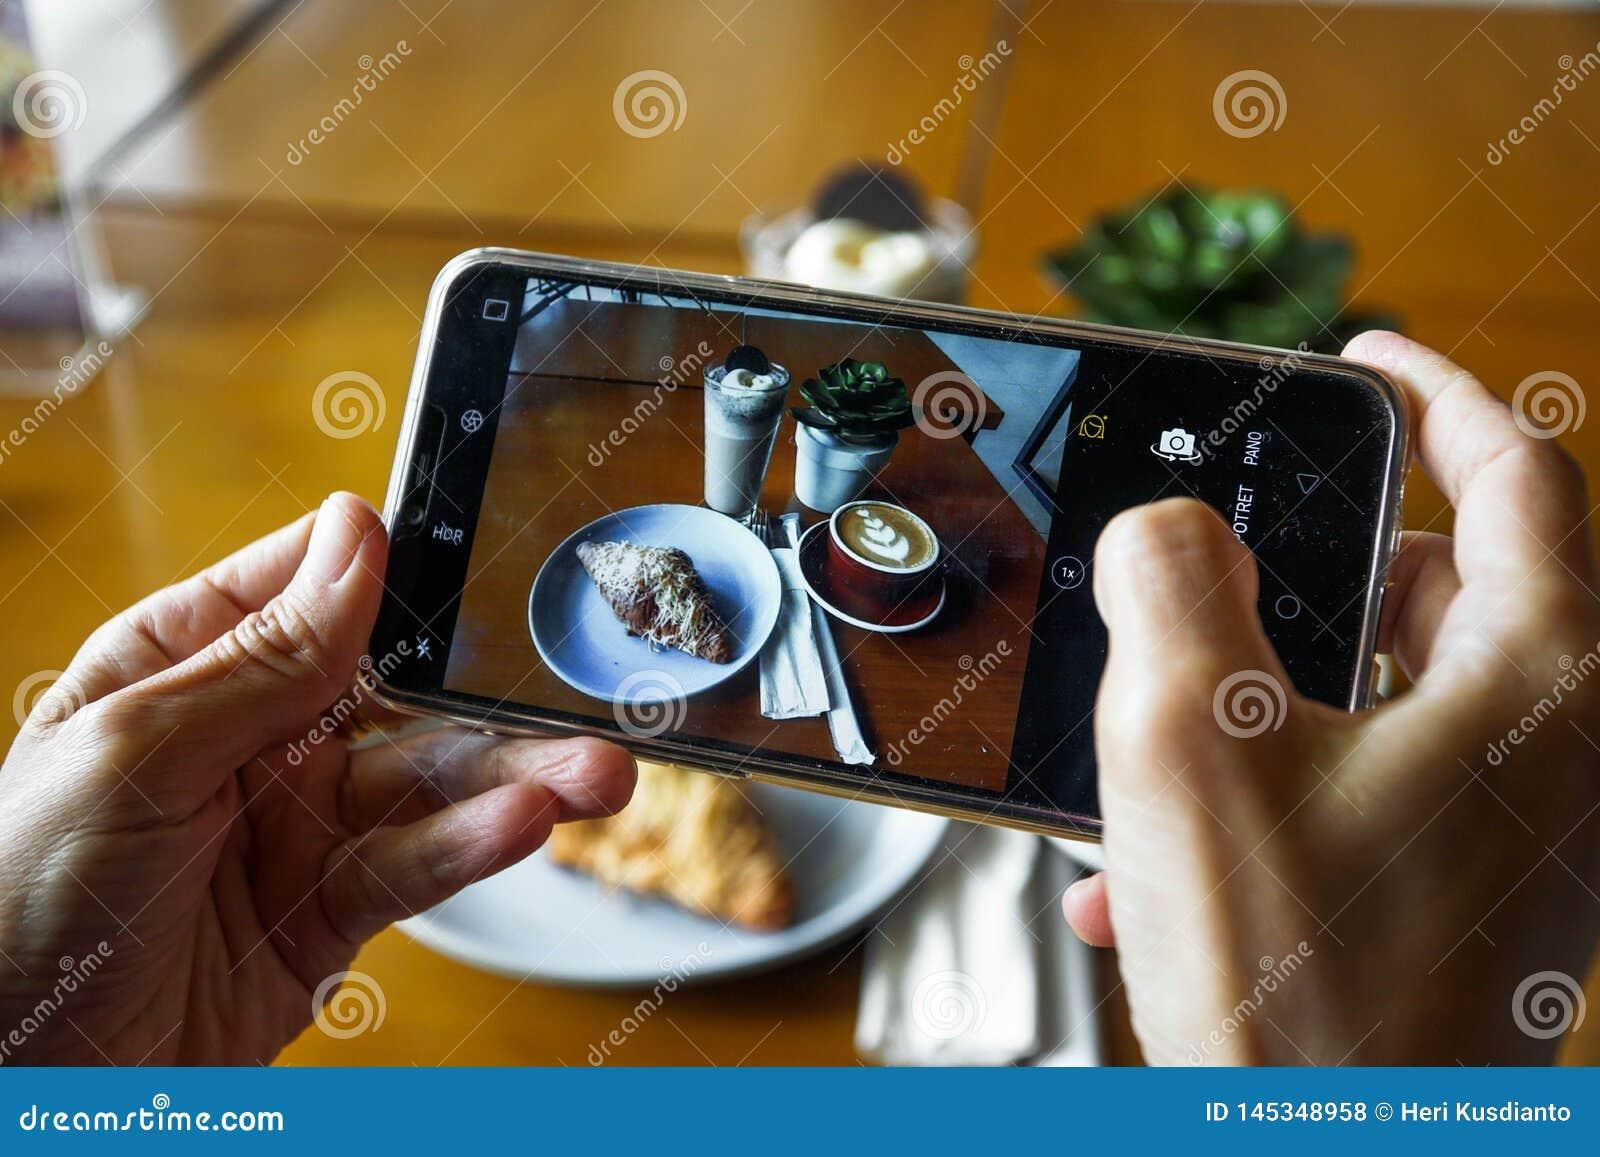 Food Photography Using Mobile Phone Product Photos Of Coffee Latte Croissant Chocolate And Blue Ocean Top View Photo Of Food Foto De Archivo Imagen De Blue Croissant 145348958